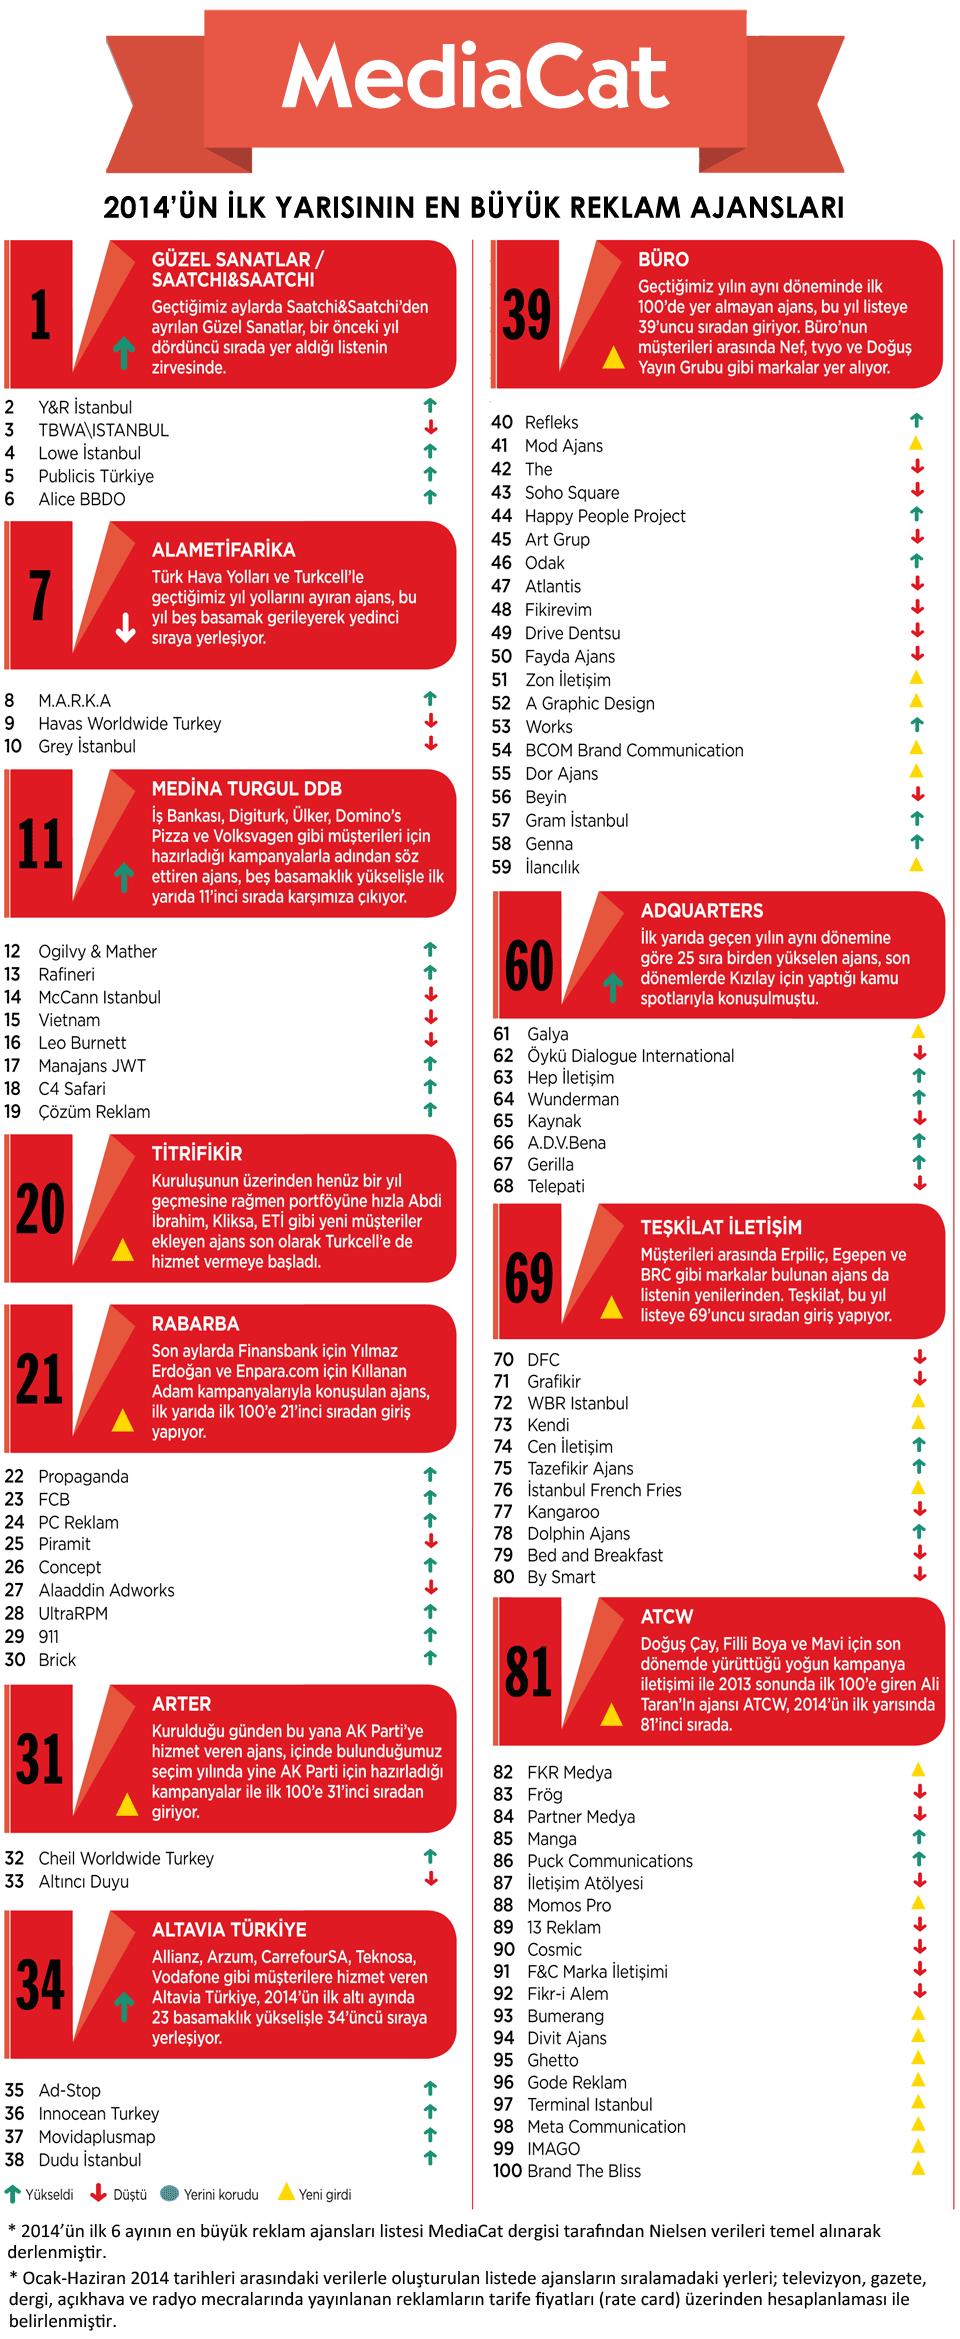 2014-un-ilk-yarisinin-en-buyuk-reklam-ajanslari-mediacat-01-buyuk